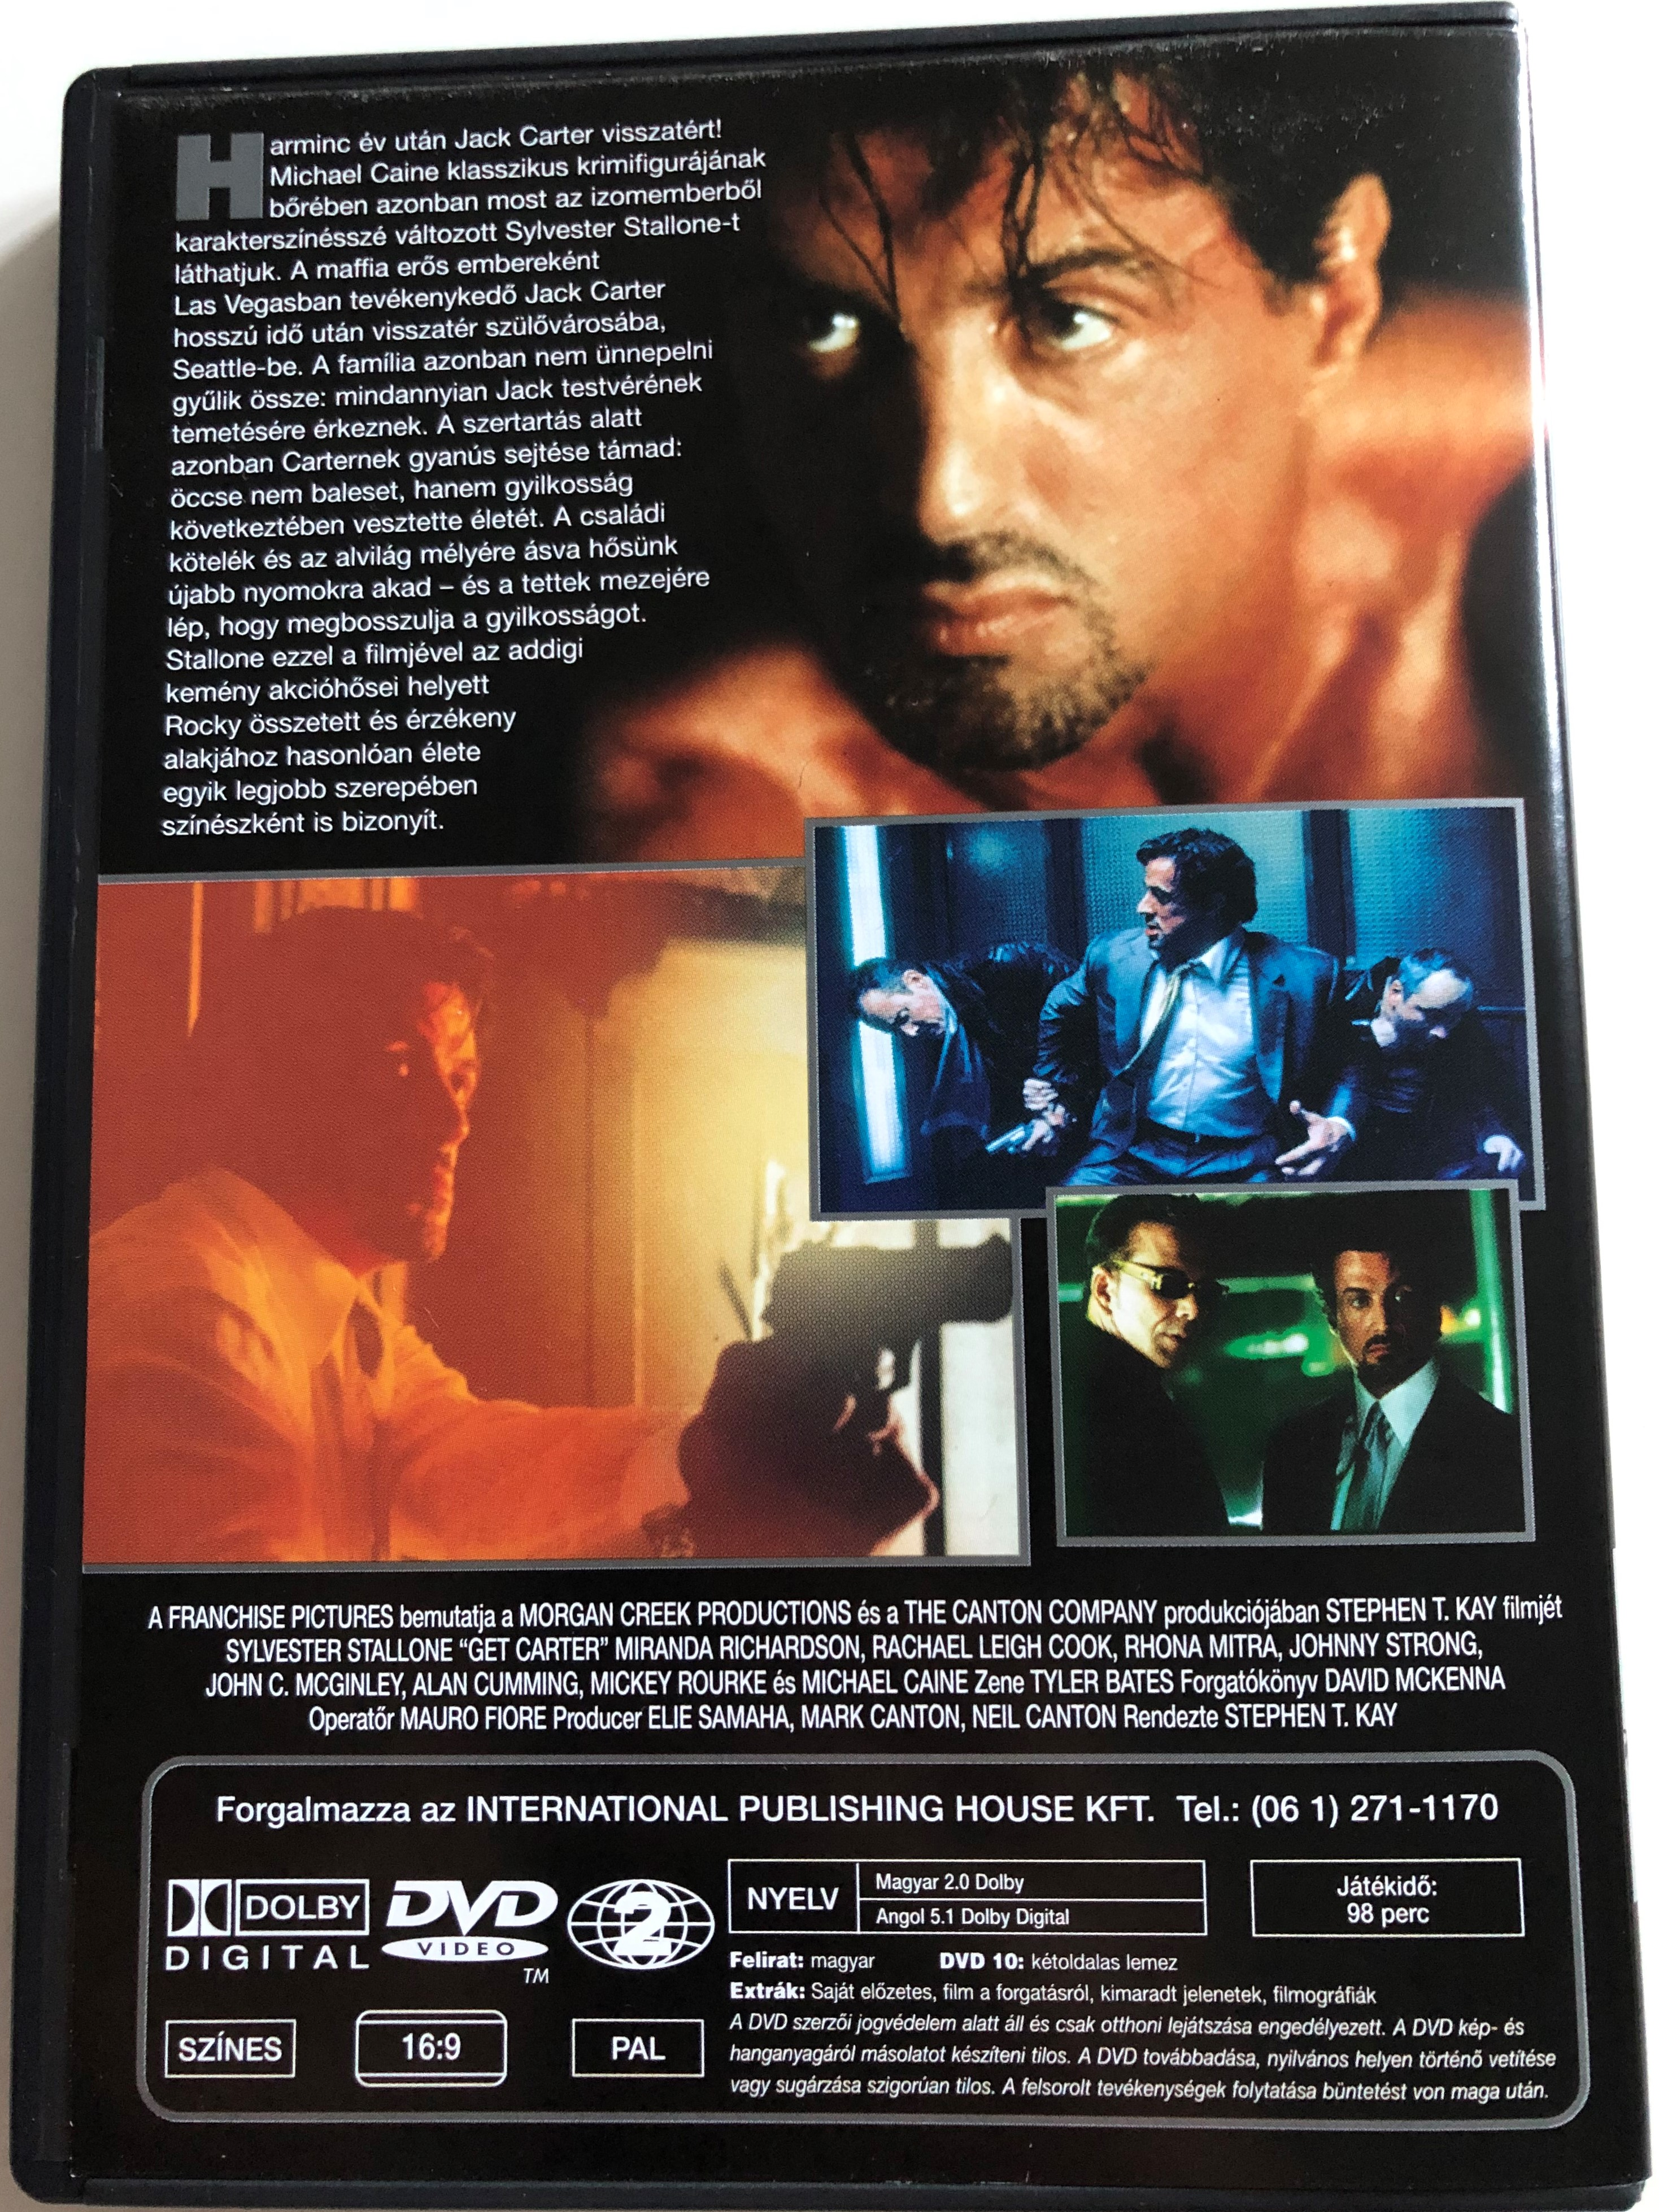 get-carter-dvd-2000-az-igazs-g-f-j-directed-by-stephen-kay-starring-sylvester-stallone-miranda-richardson-rachael-leigh-cook-rhona-mitra-2-.jpg